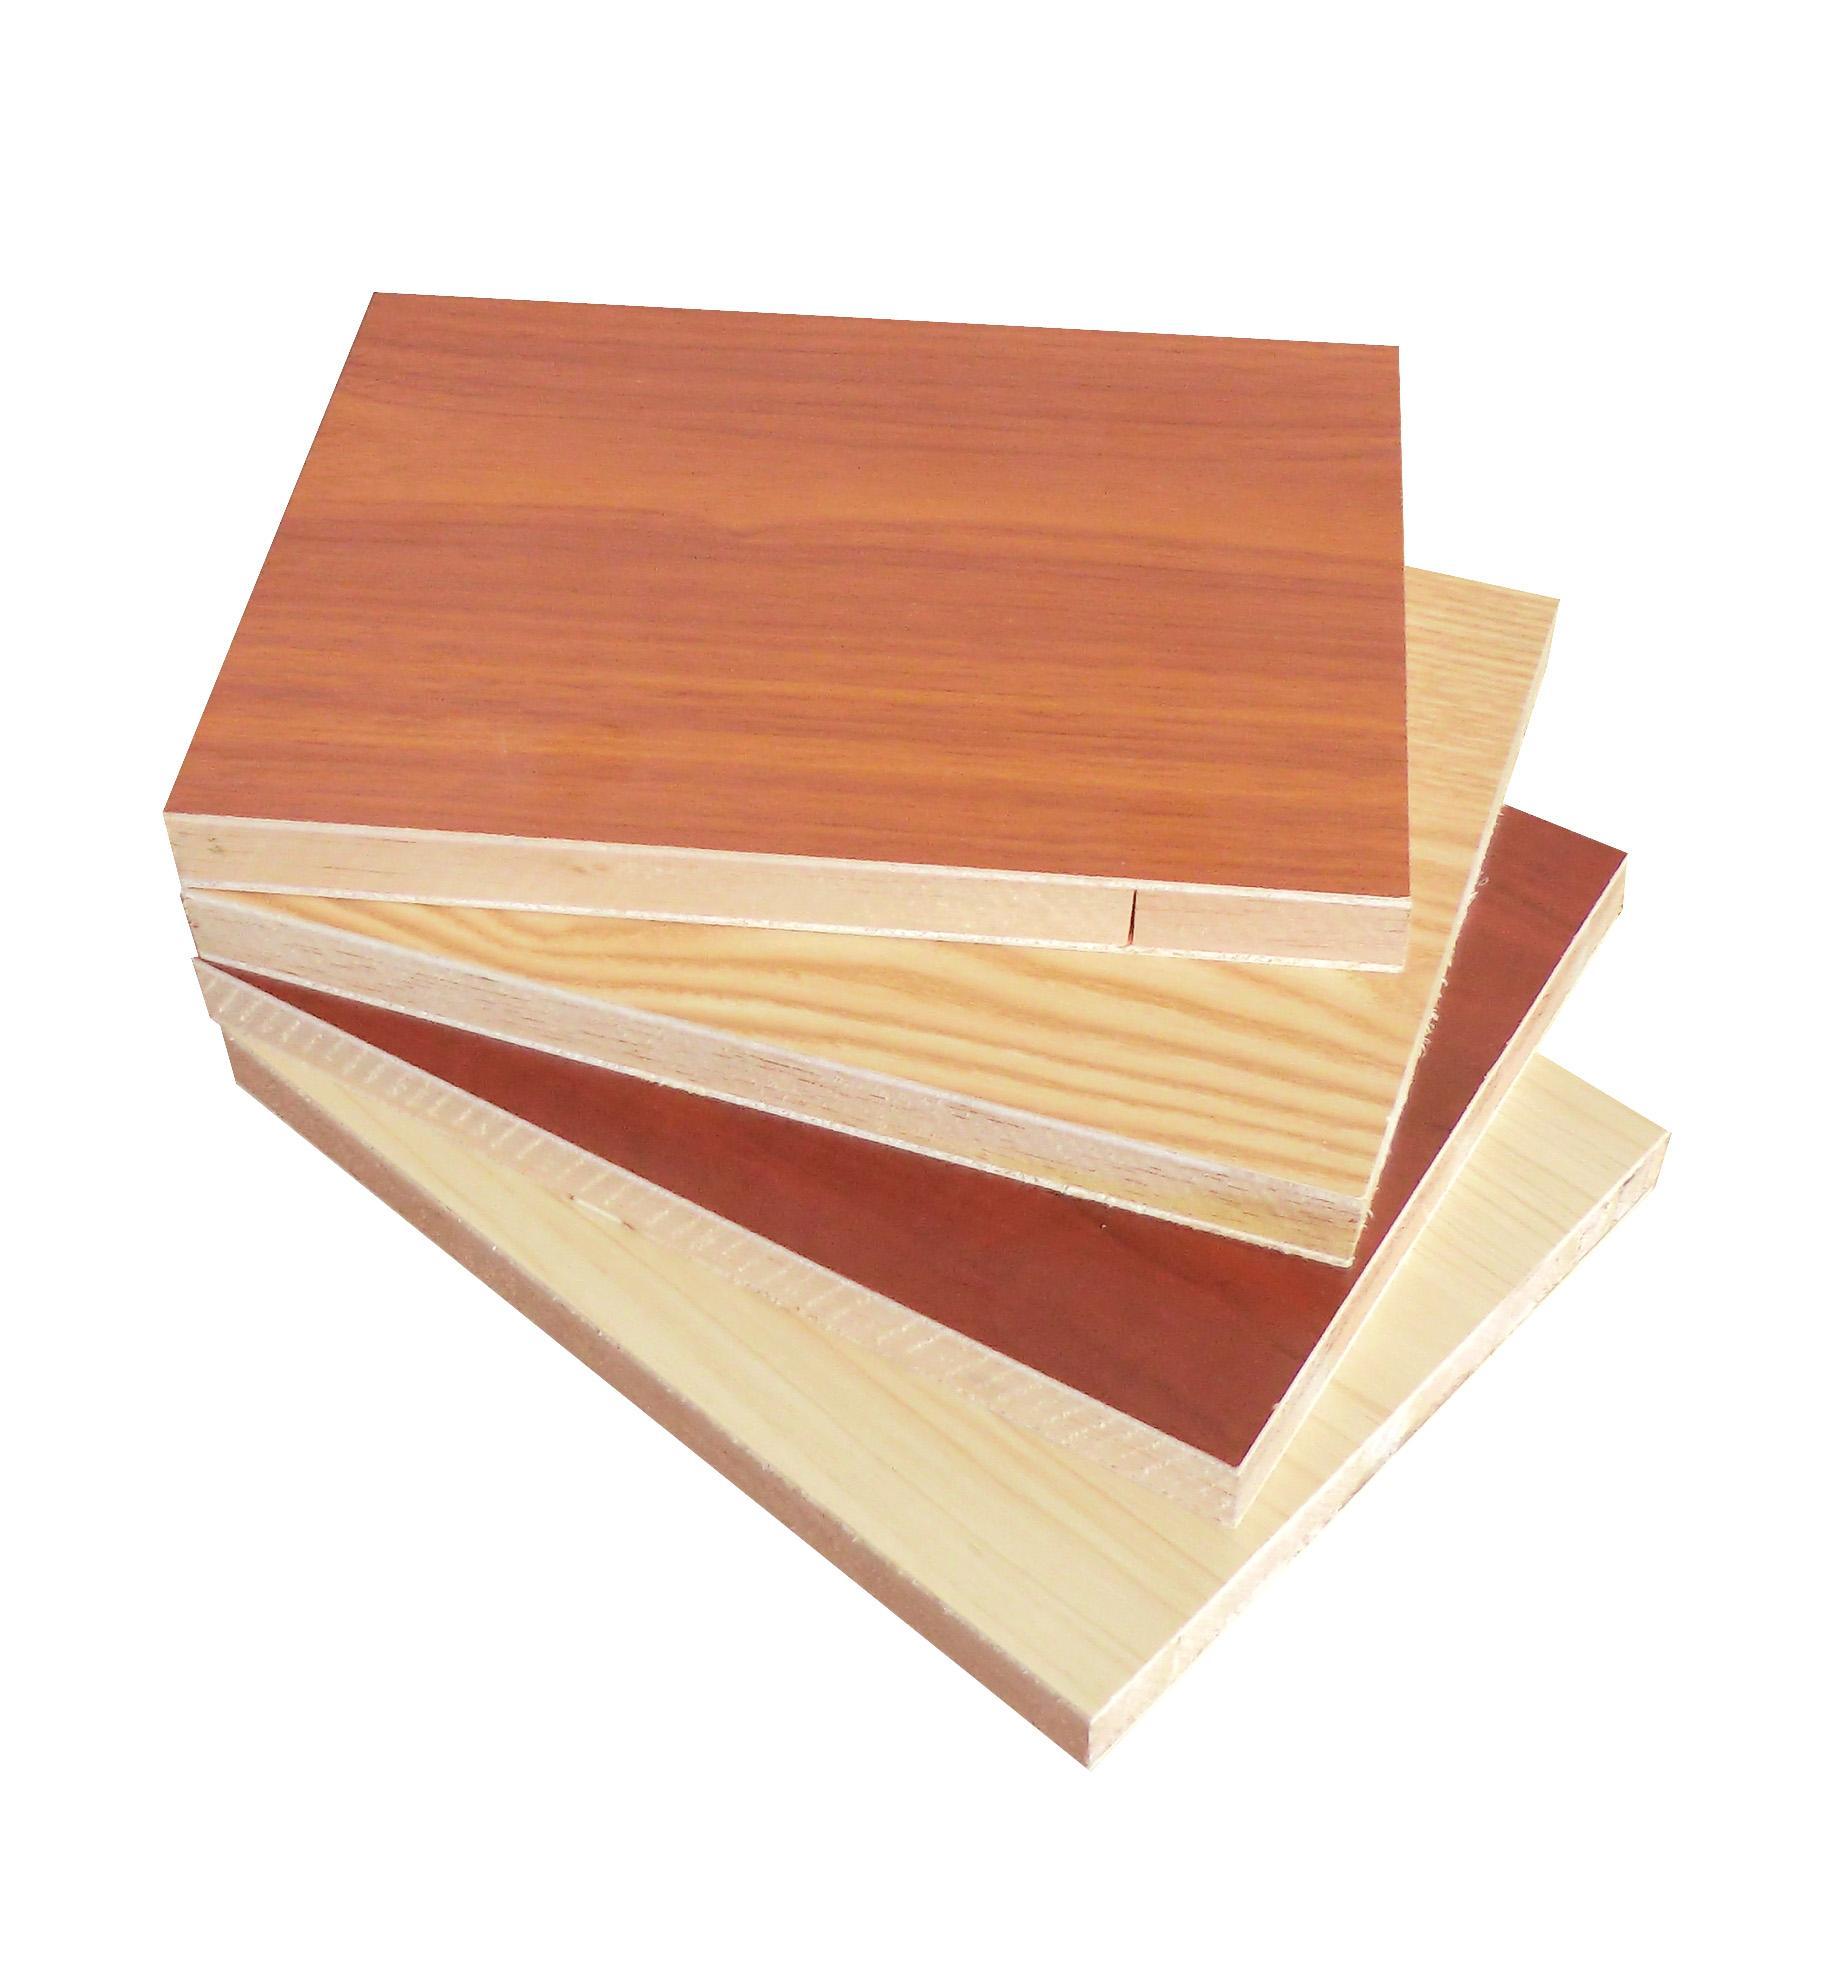 melamine faced block board plywood kitchen cabinet